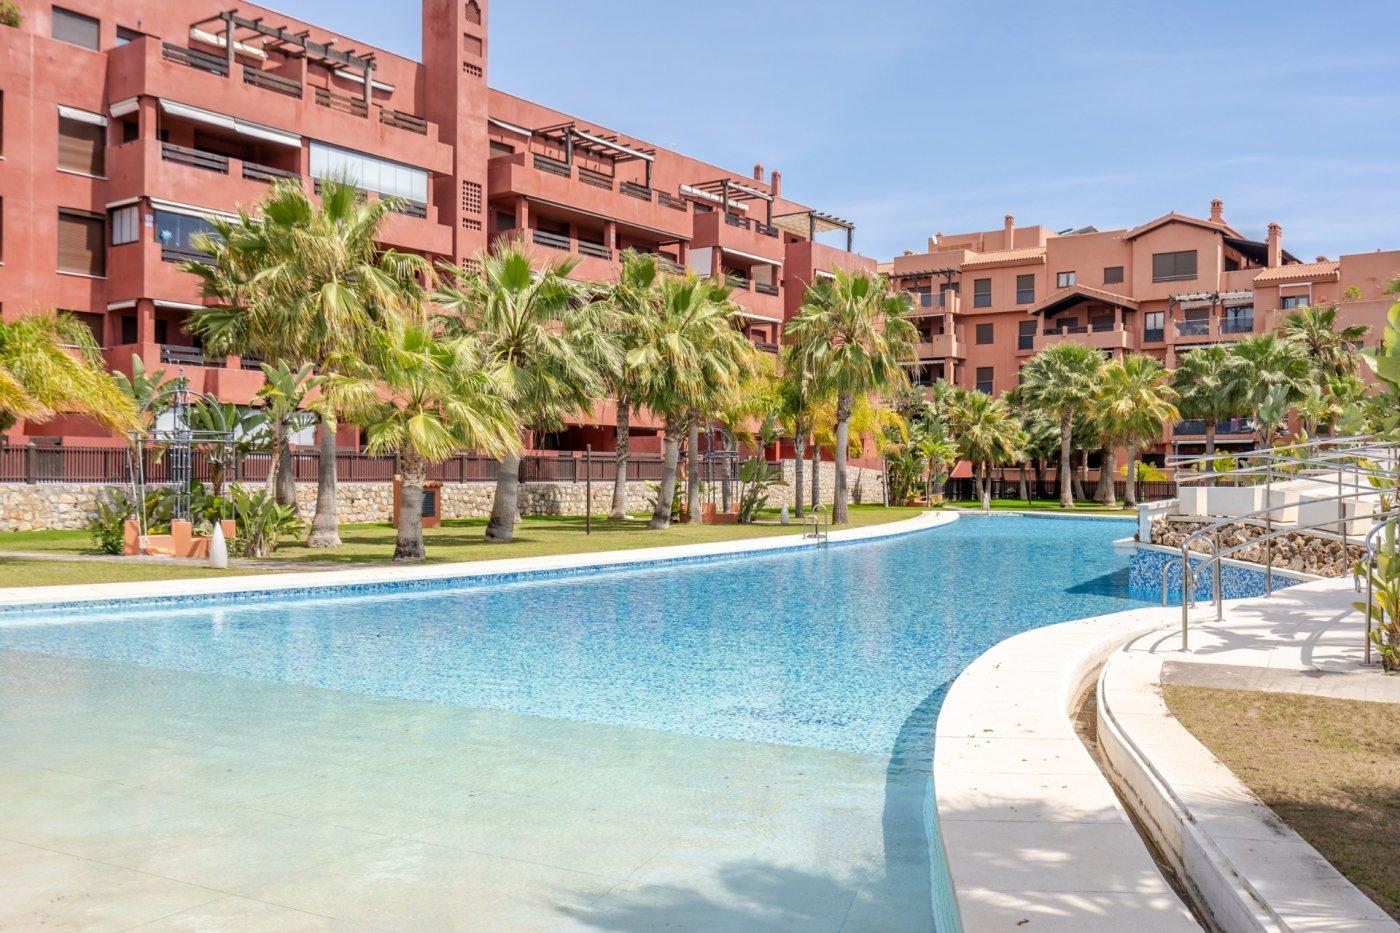 Playa Granada Motril